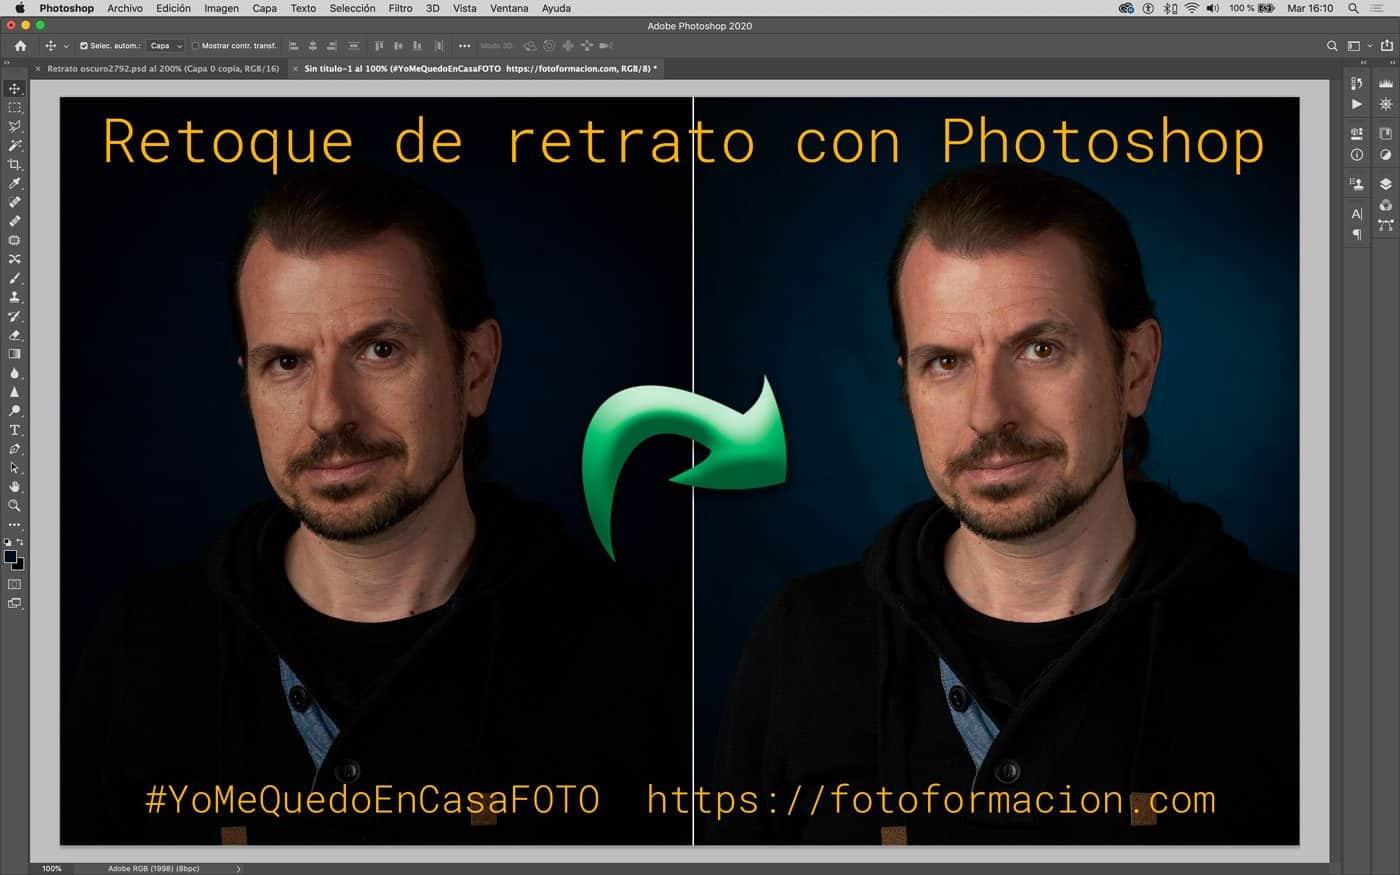 Retoque de retrato con fondo oscuro en Photoshop